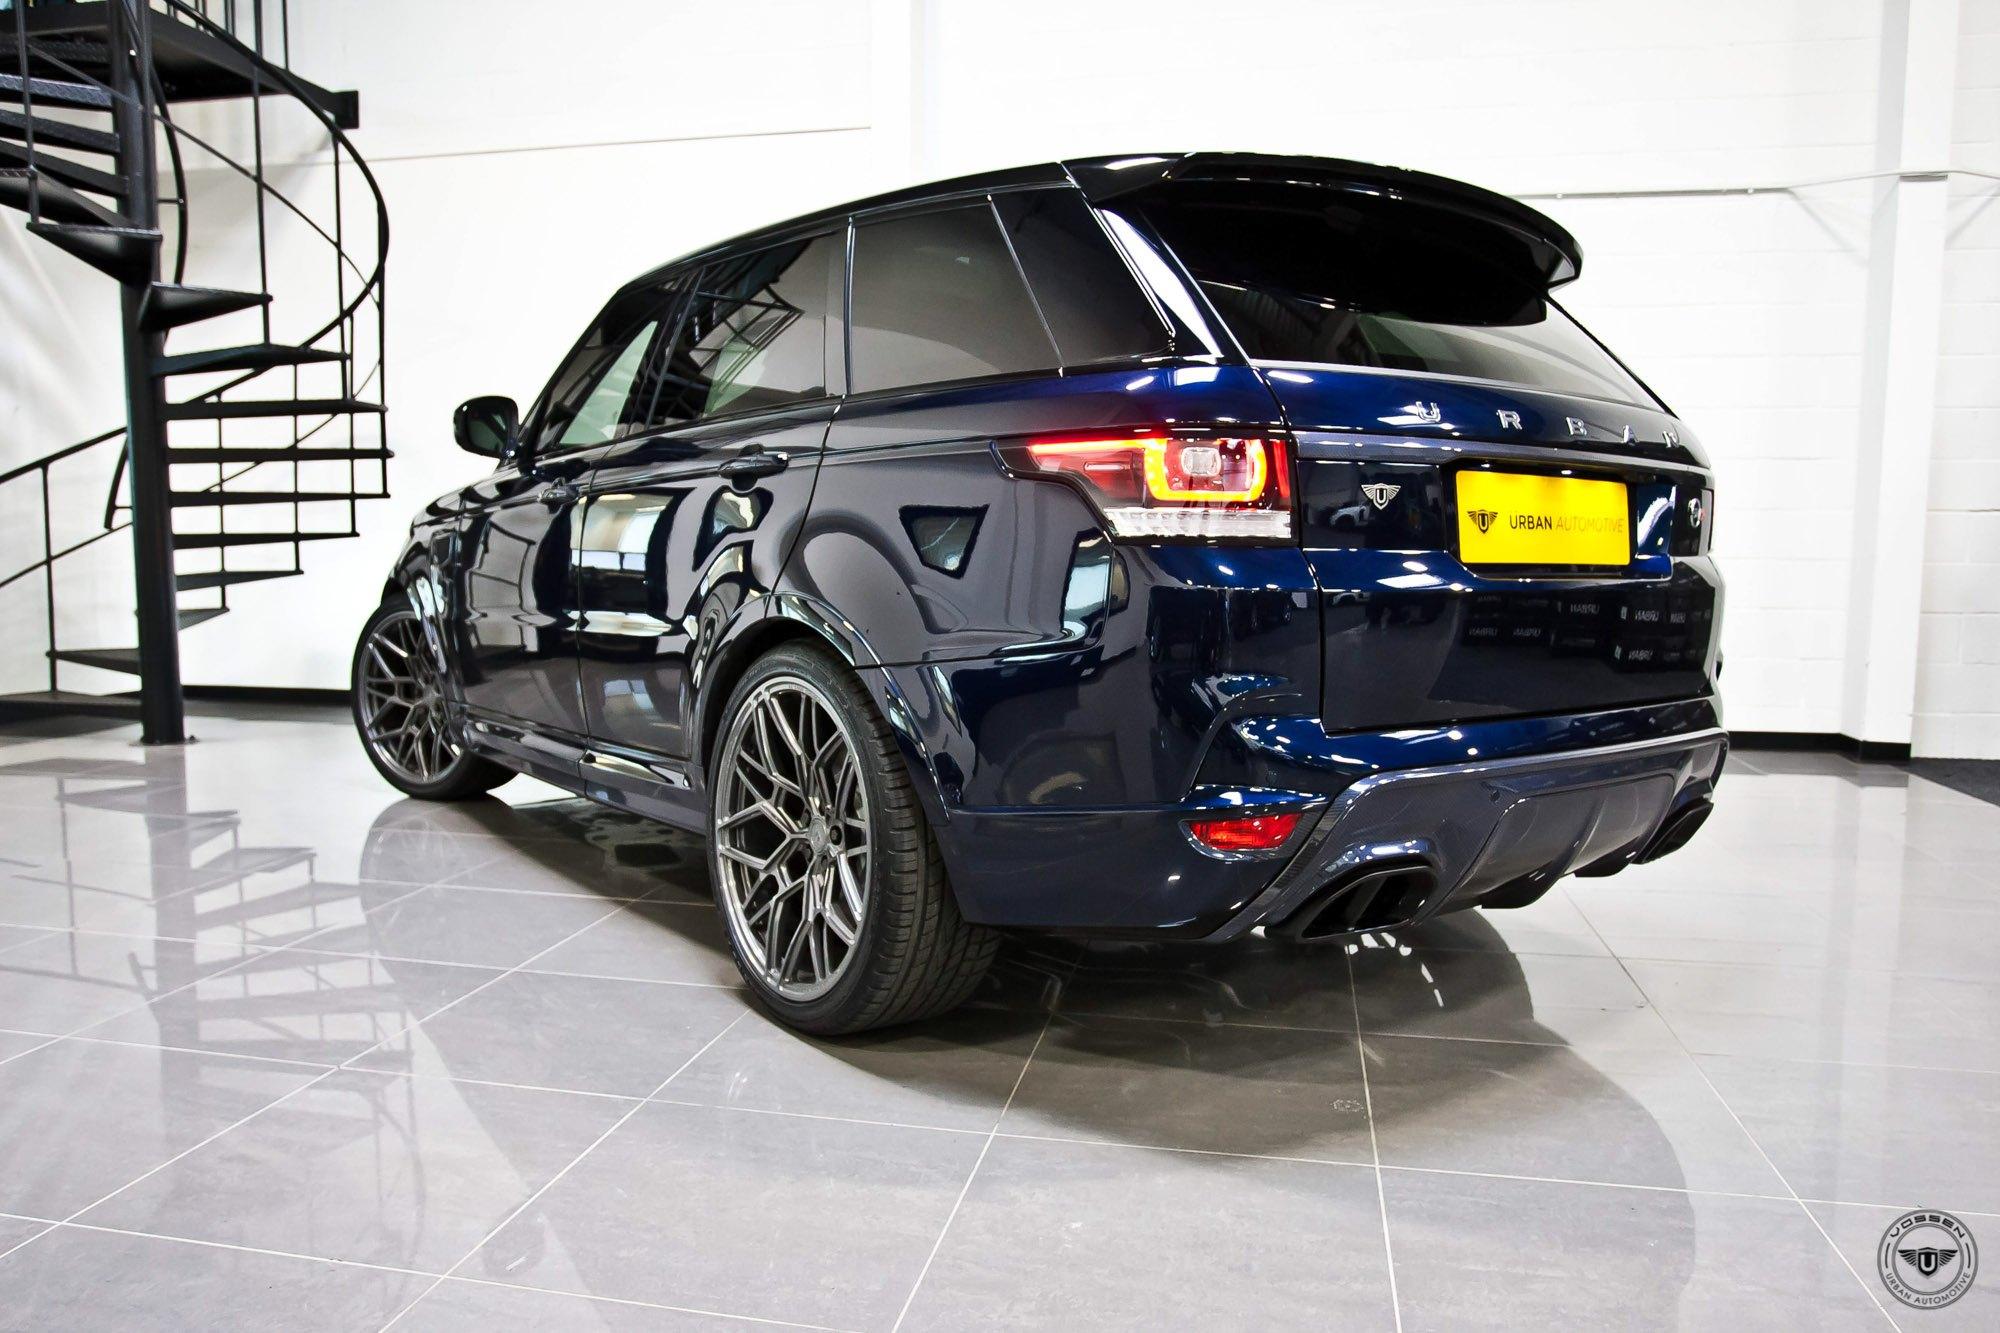 Blue range rover sport charcoal forged vossen wheels for Land rover tarbes garage moderne